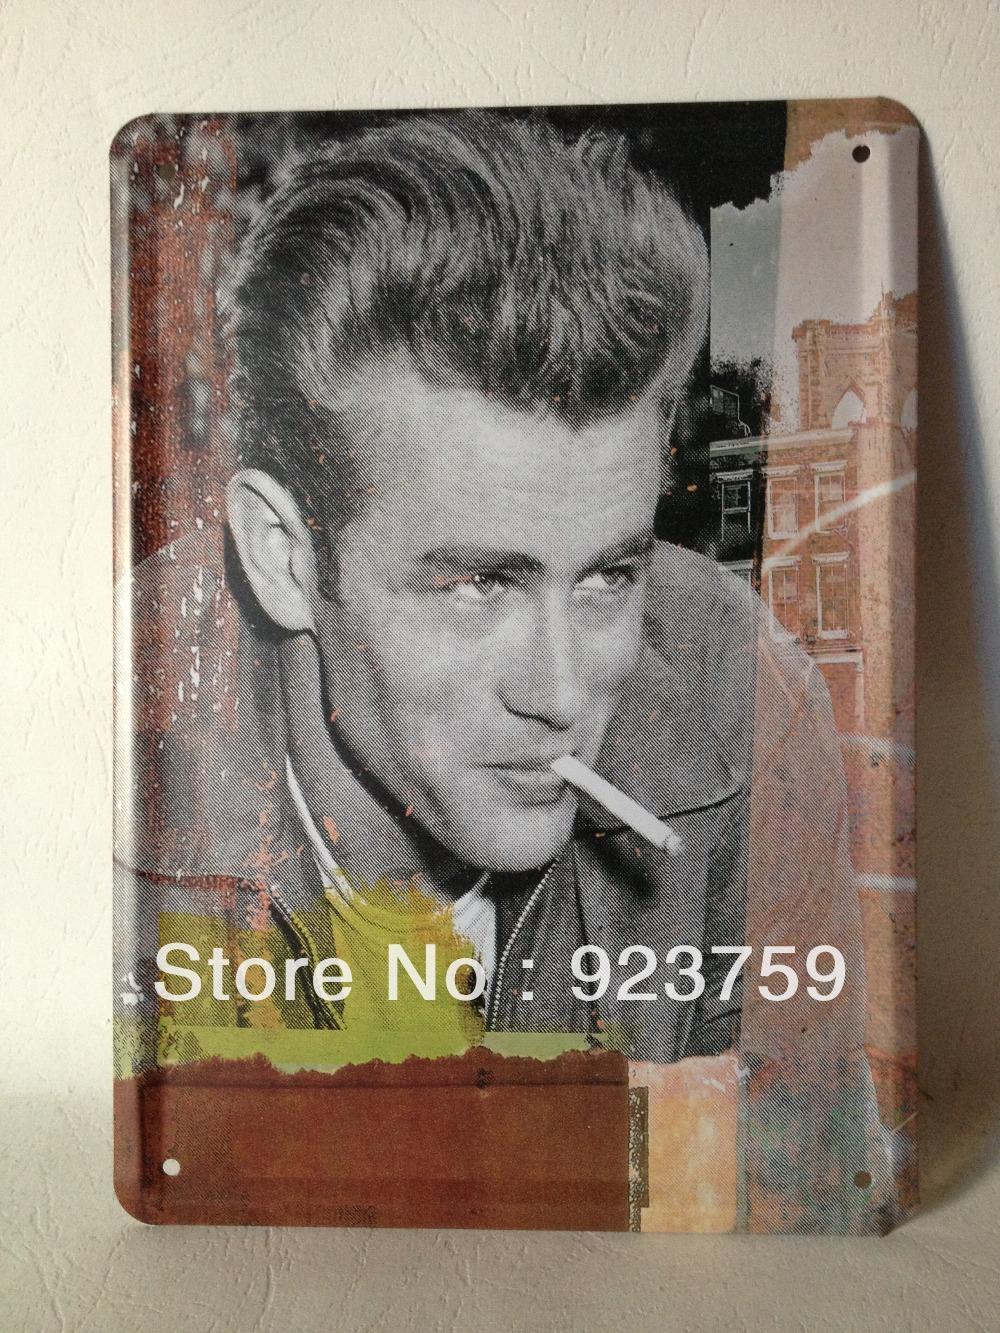 15x20cm SOMING MAN vintageTin Sign Bar pub home Wall Decor Retro Metal Art Poster(China (Mainland))